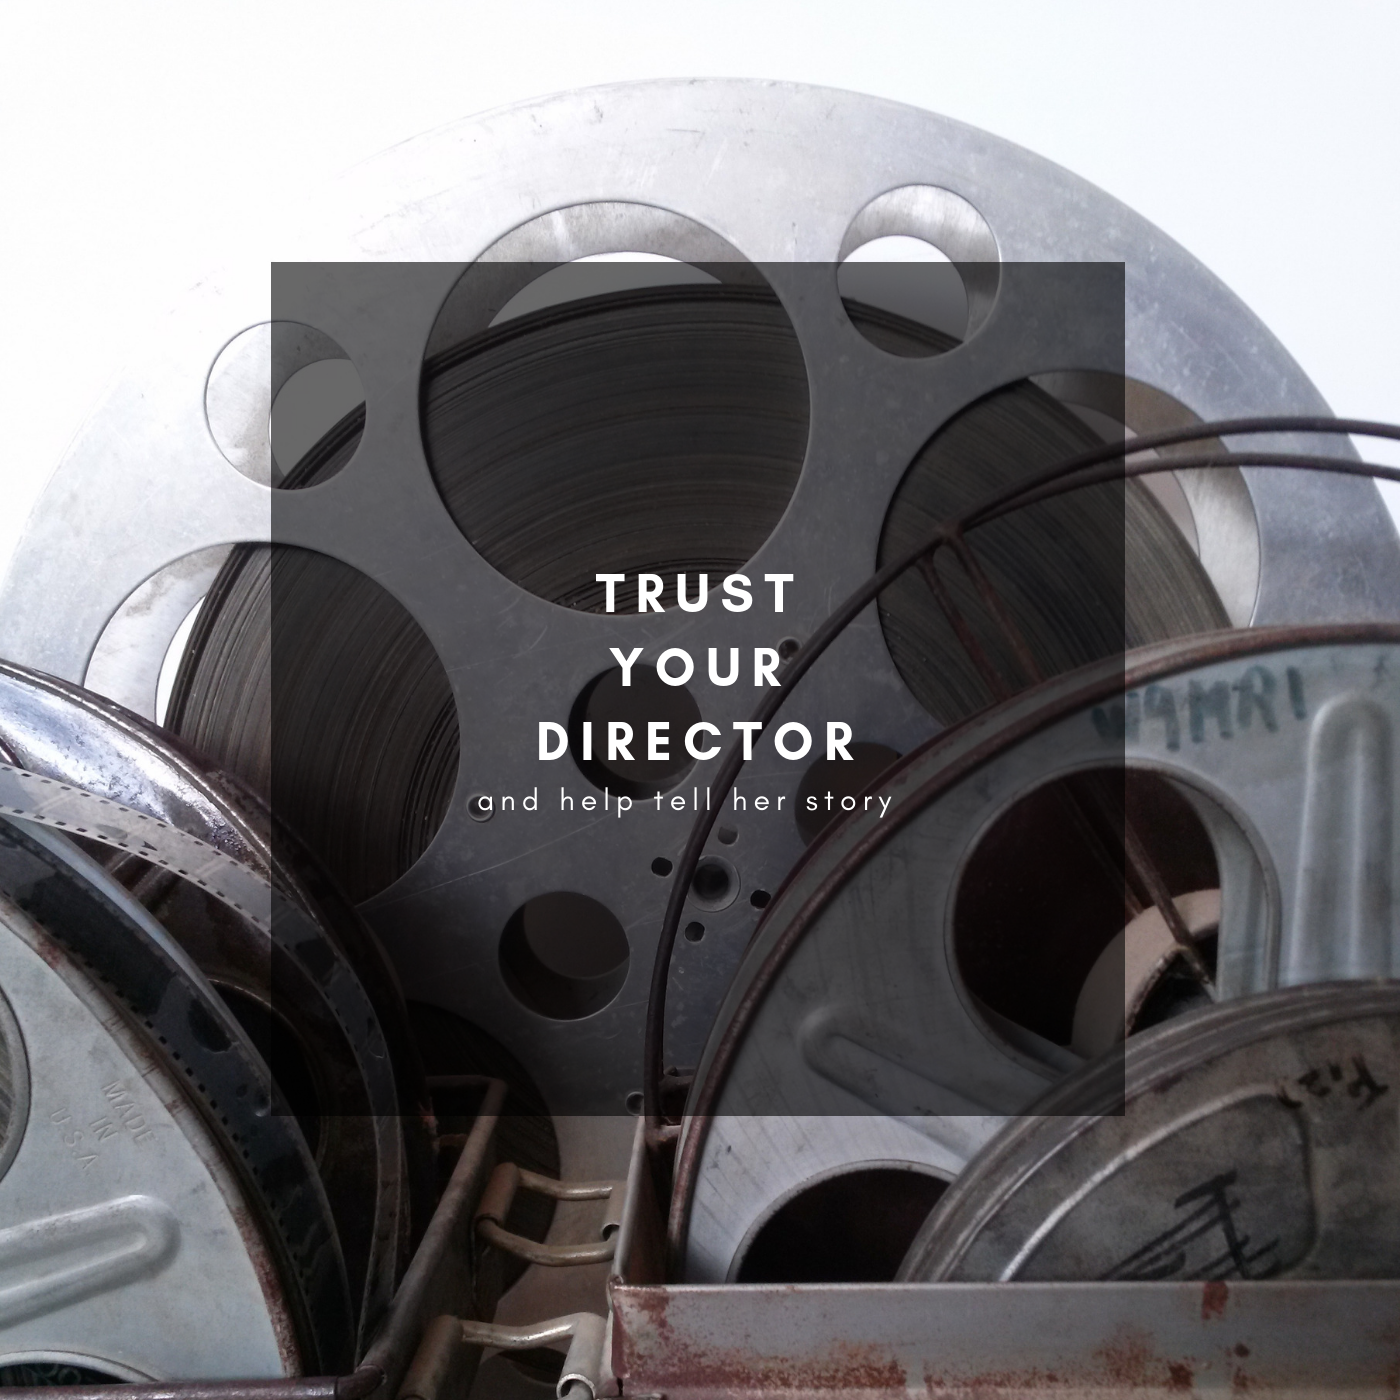 Trust your Director - Alessandro Mastroianni's Blog